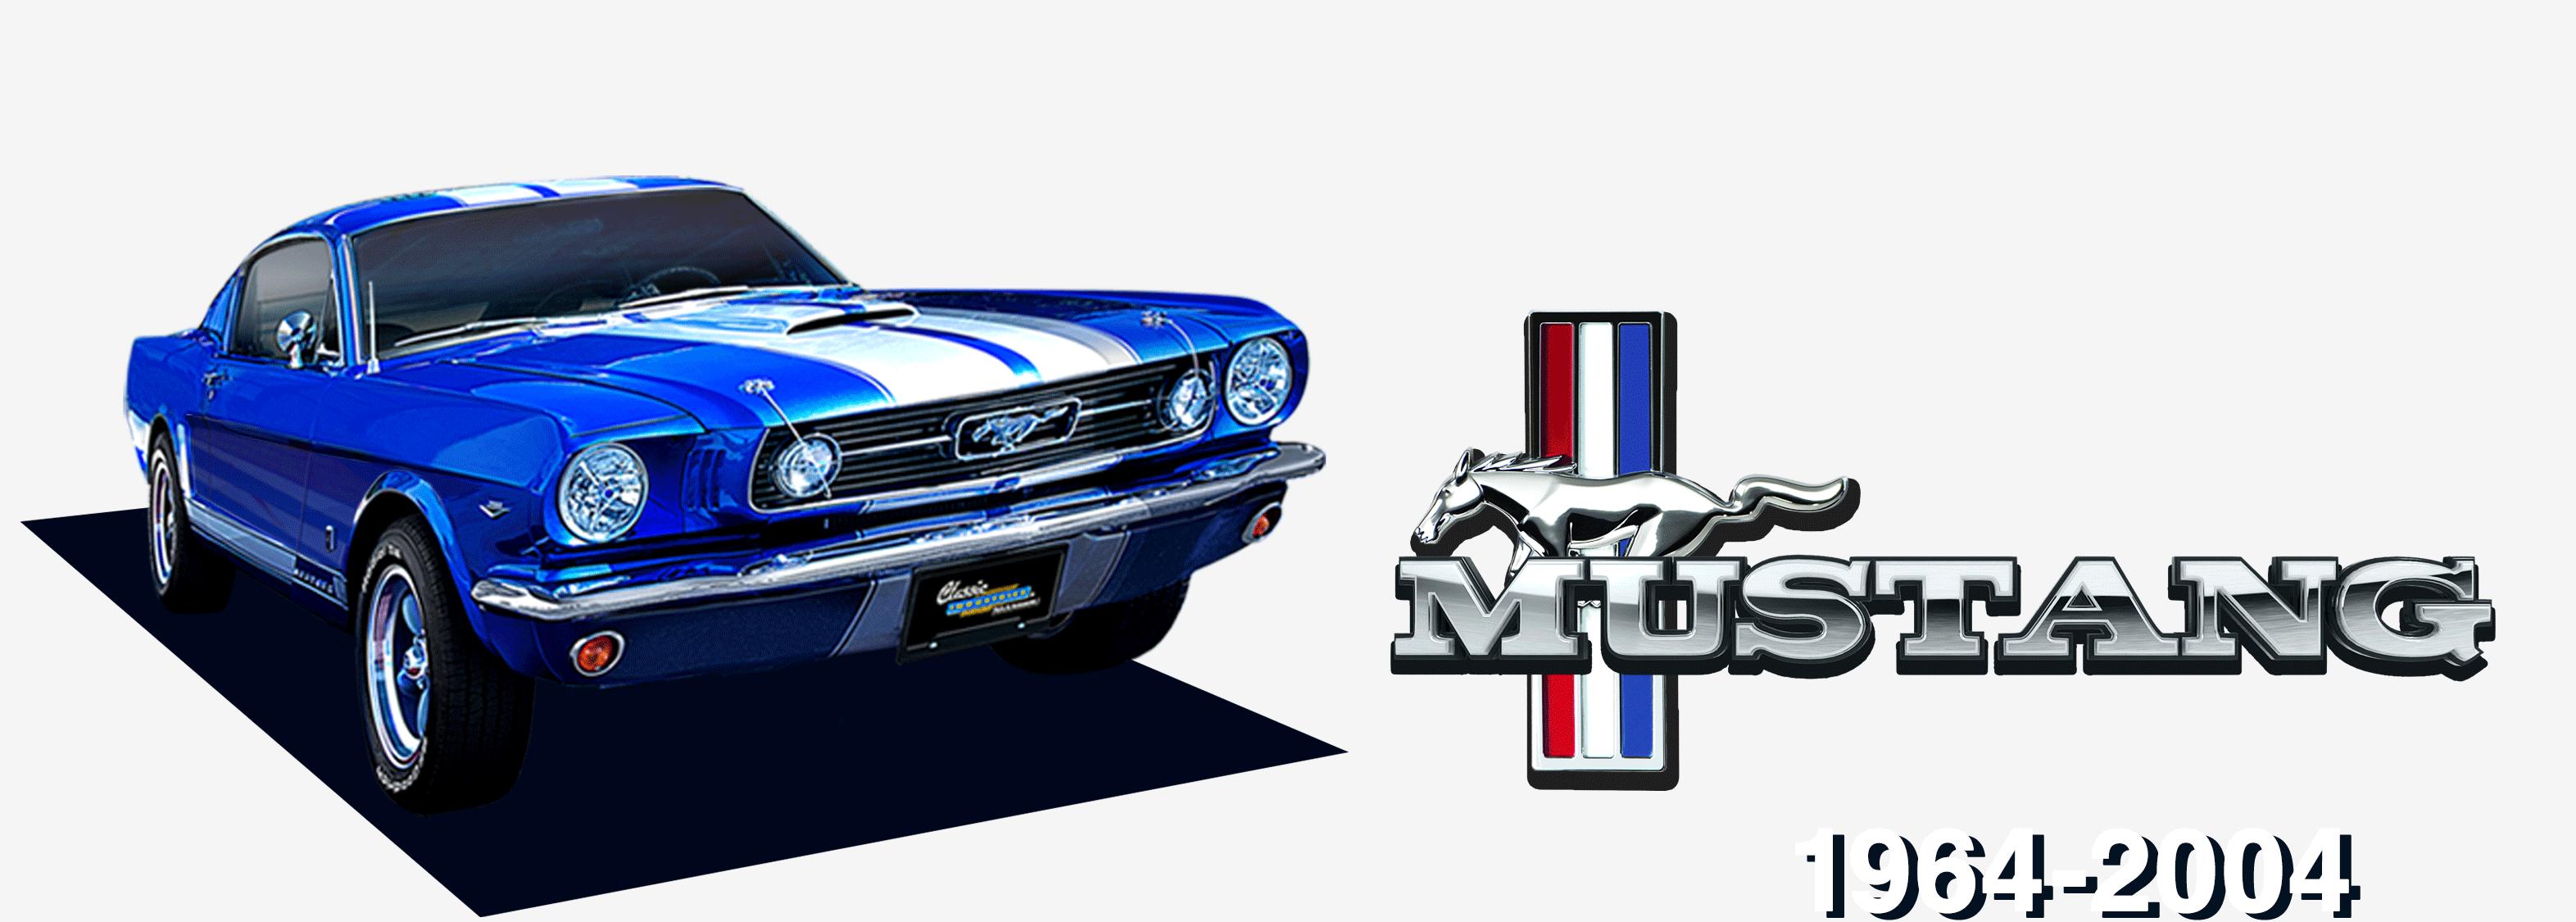 1964-1973 Mustang